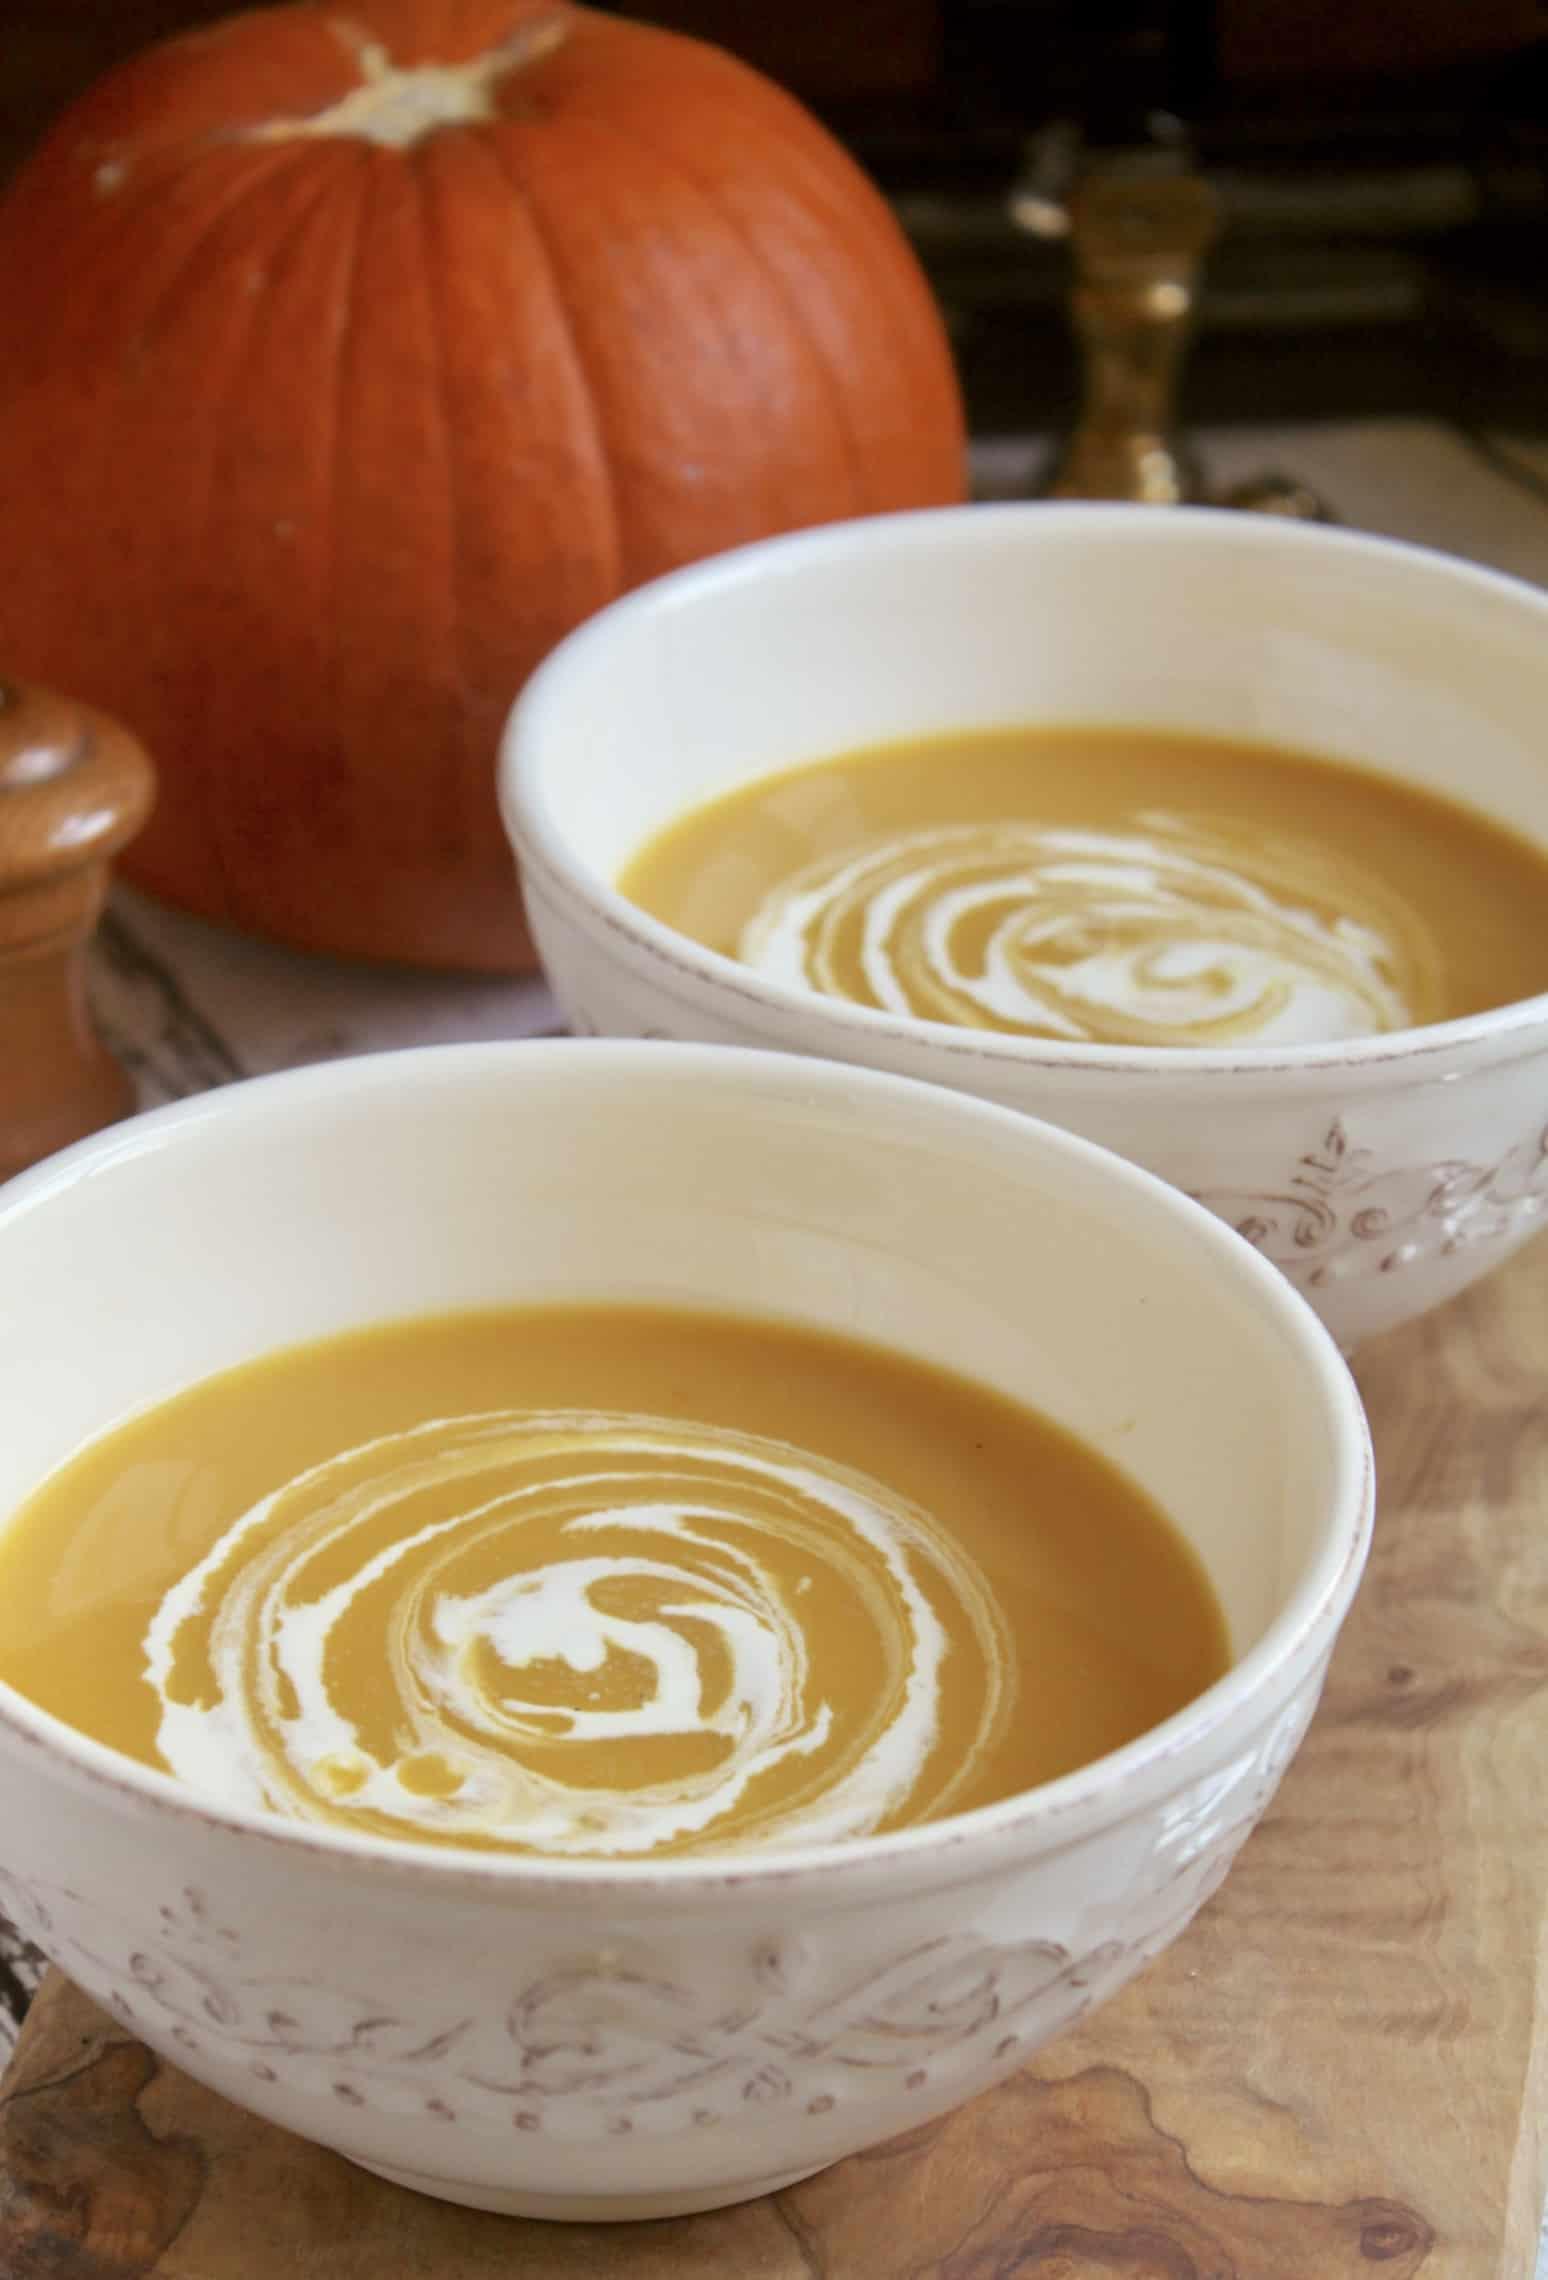 pumpkin soup in bowls